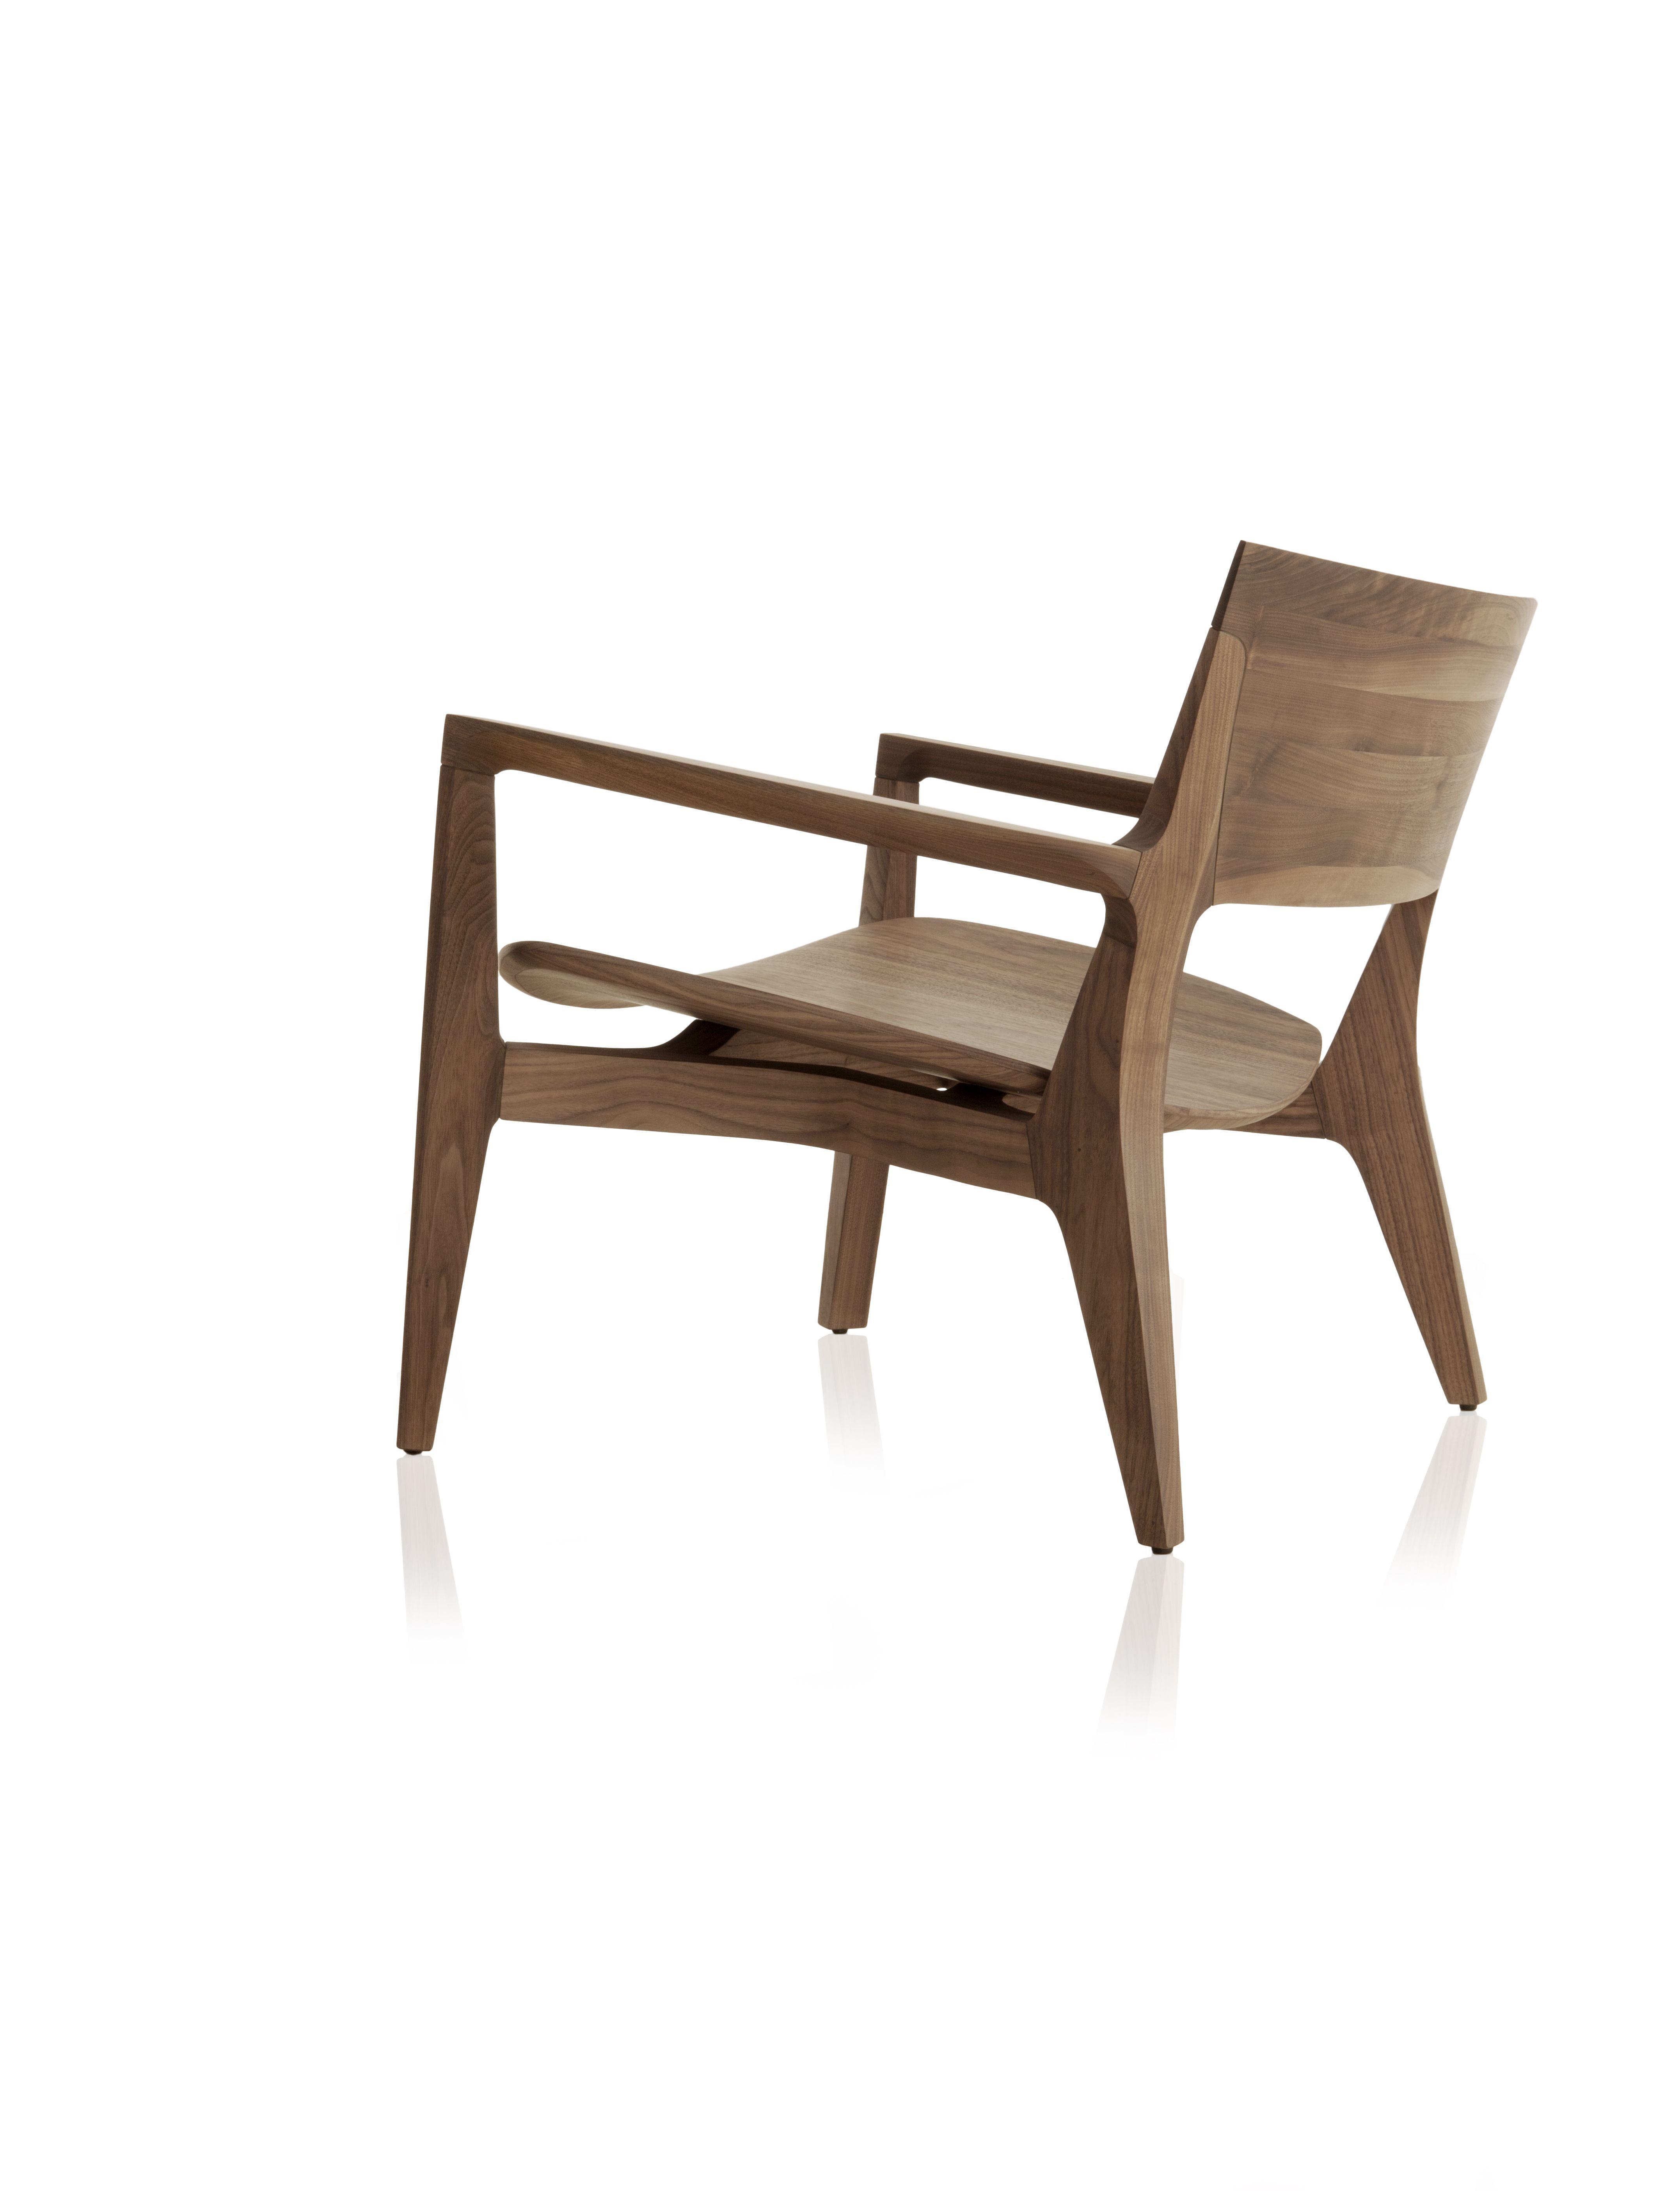 Mirah Armchair By Sollos Archello In 2020 Contemporary Armchair Furniture Chair